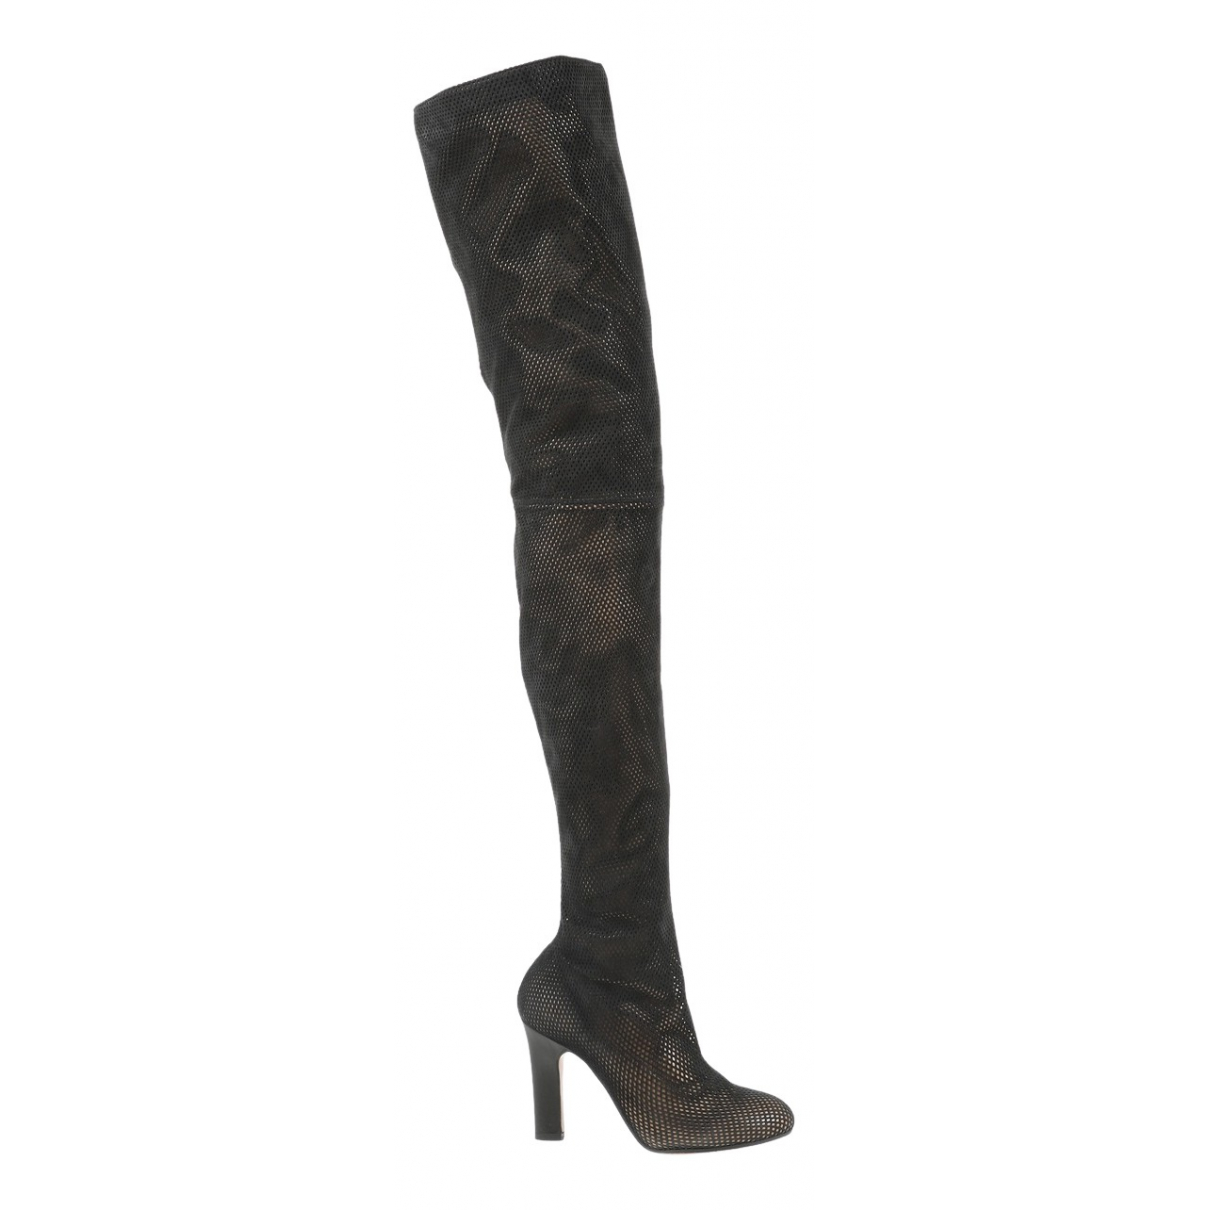 Maison Martin Margiela \N Black Suede Boots for Women 39 EU